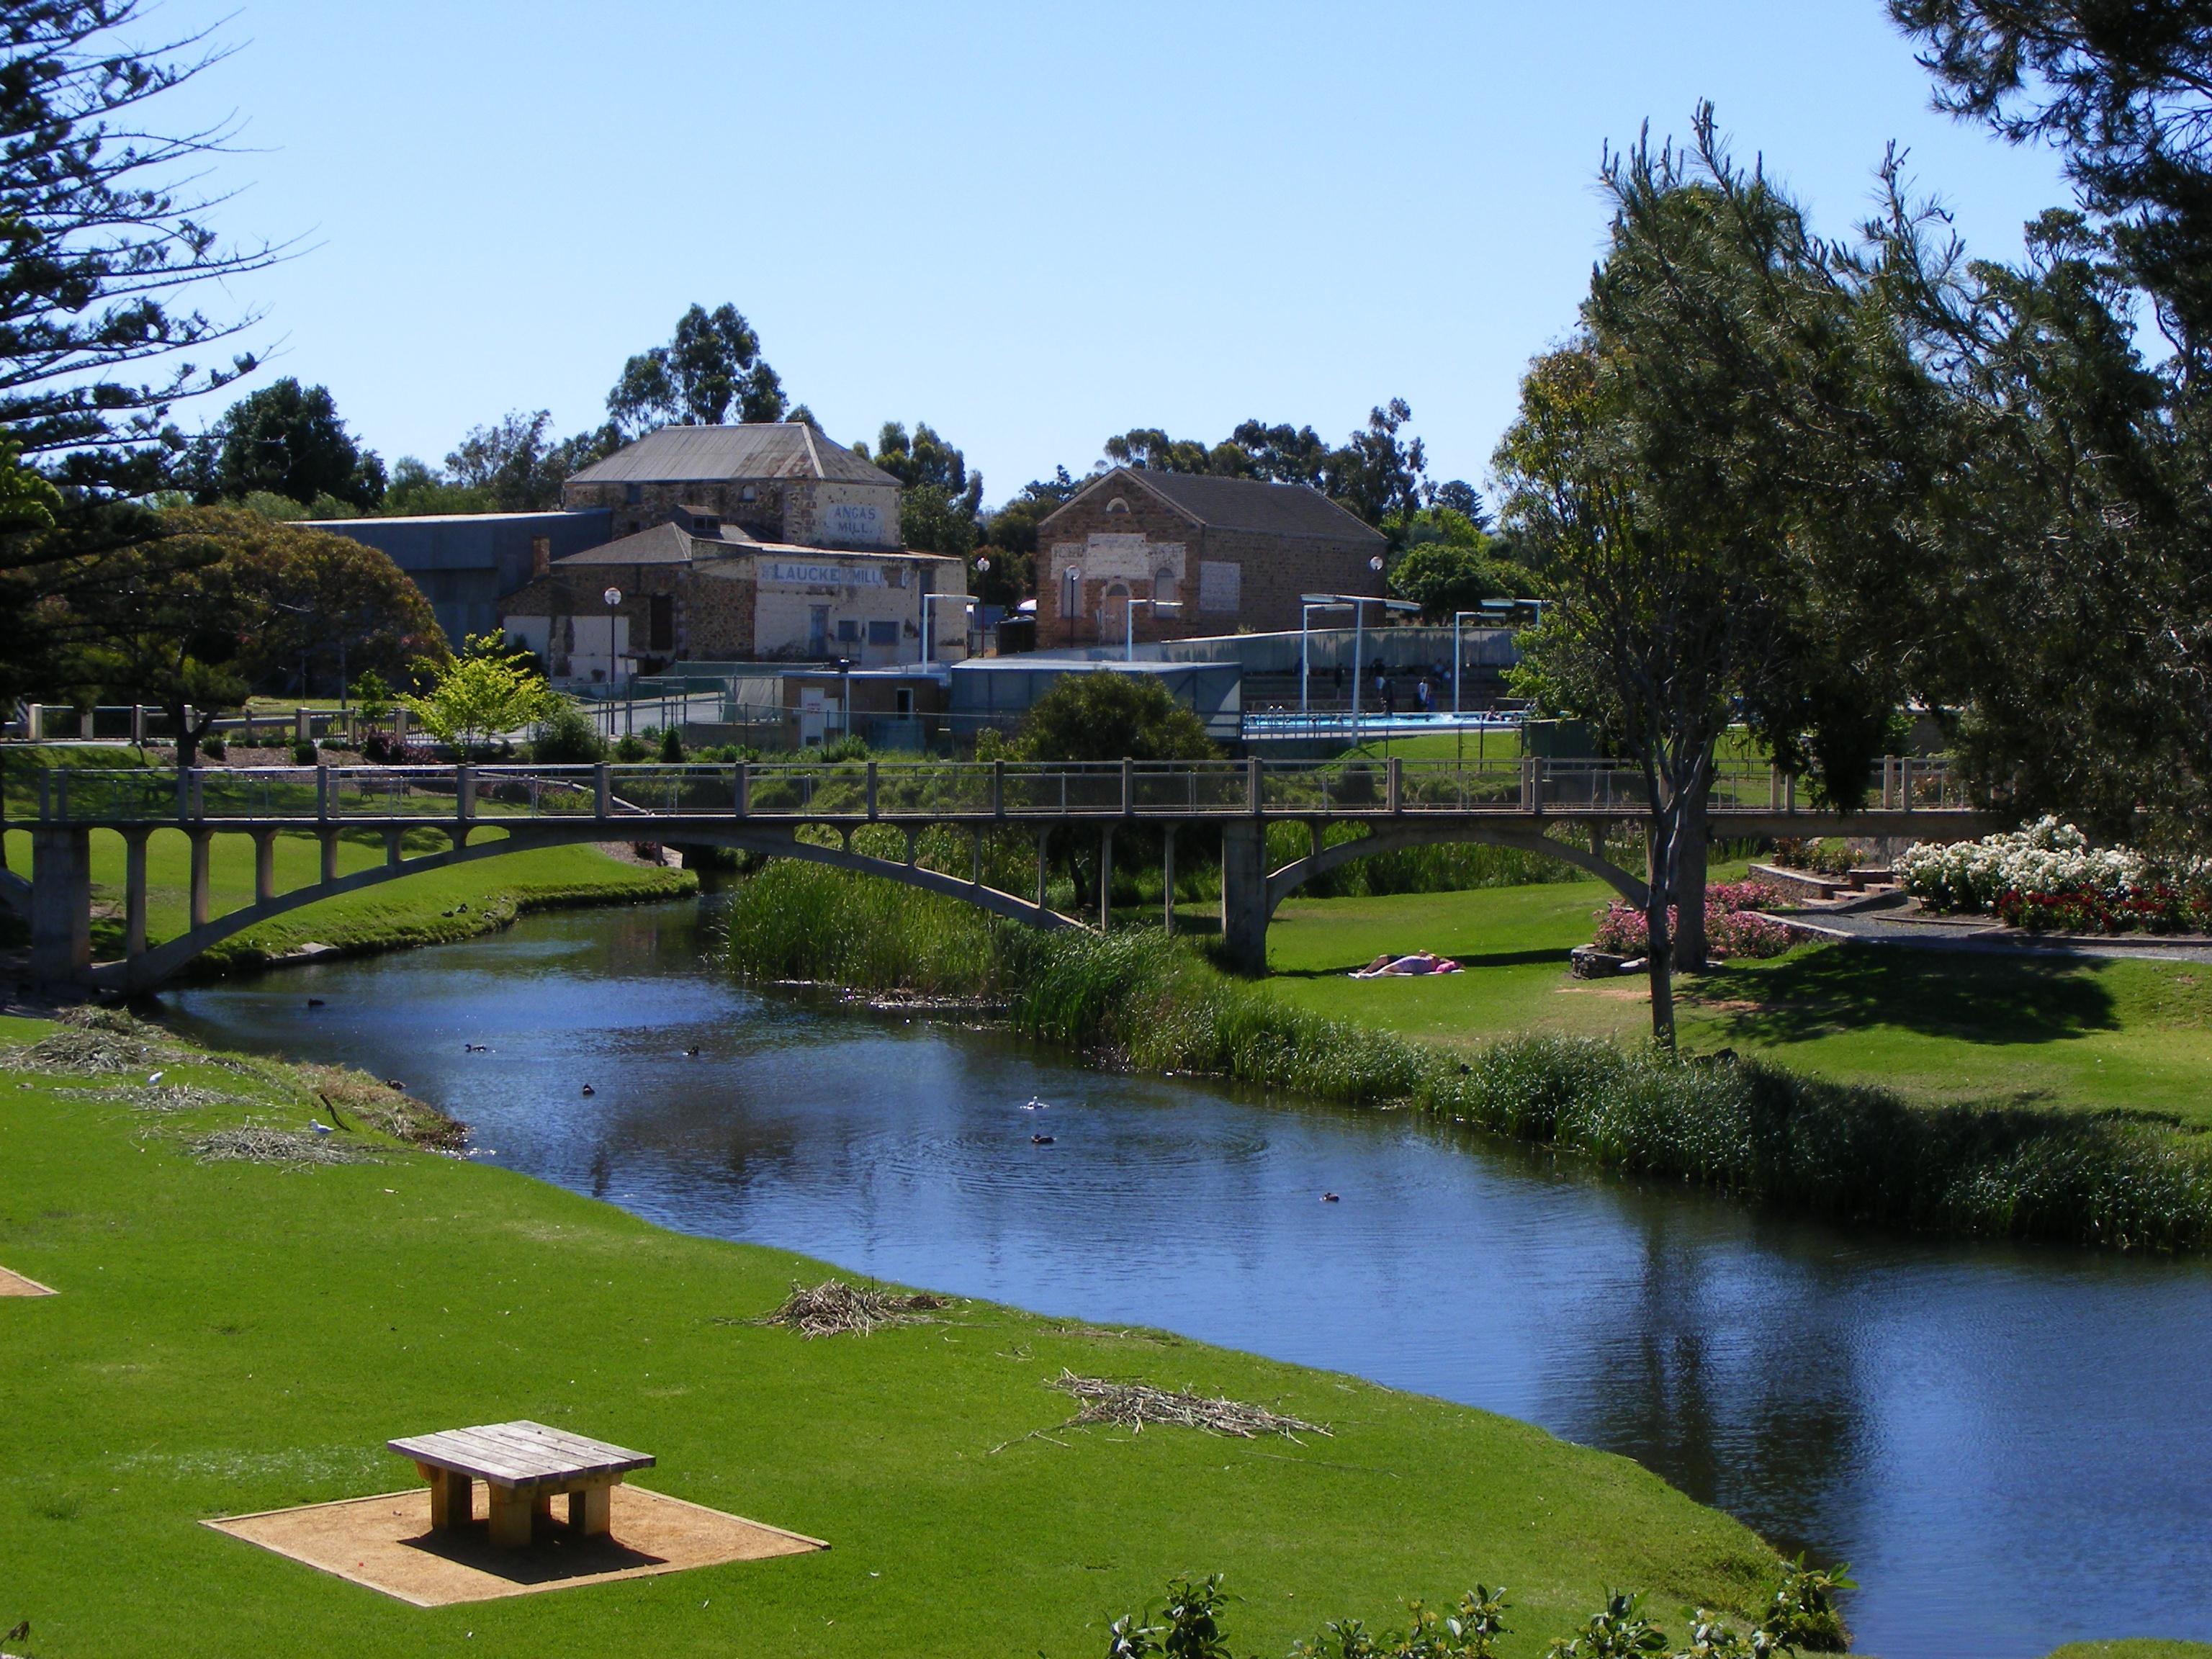 Strathalbyn Australia  city photos gallery : Description Strathalbyn memorial gardens